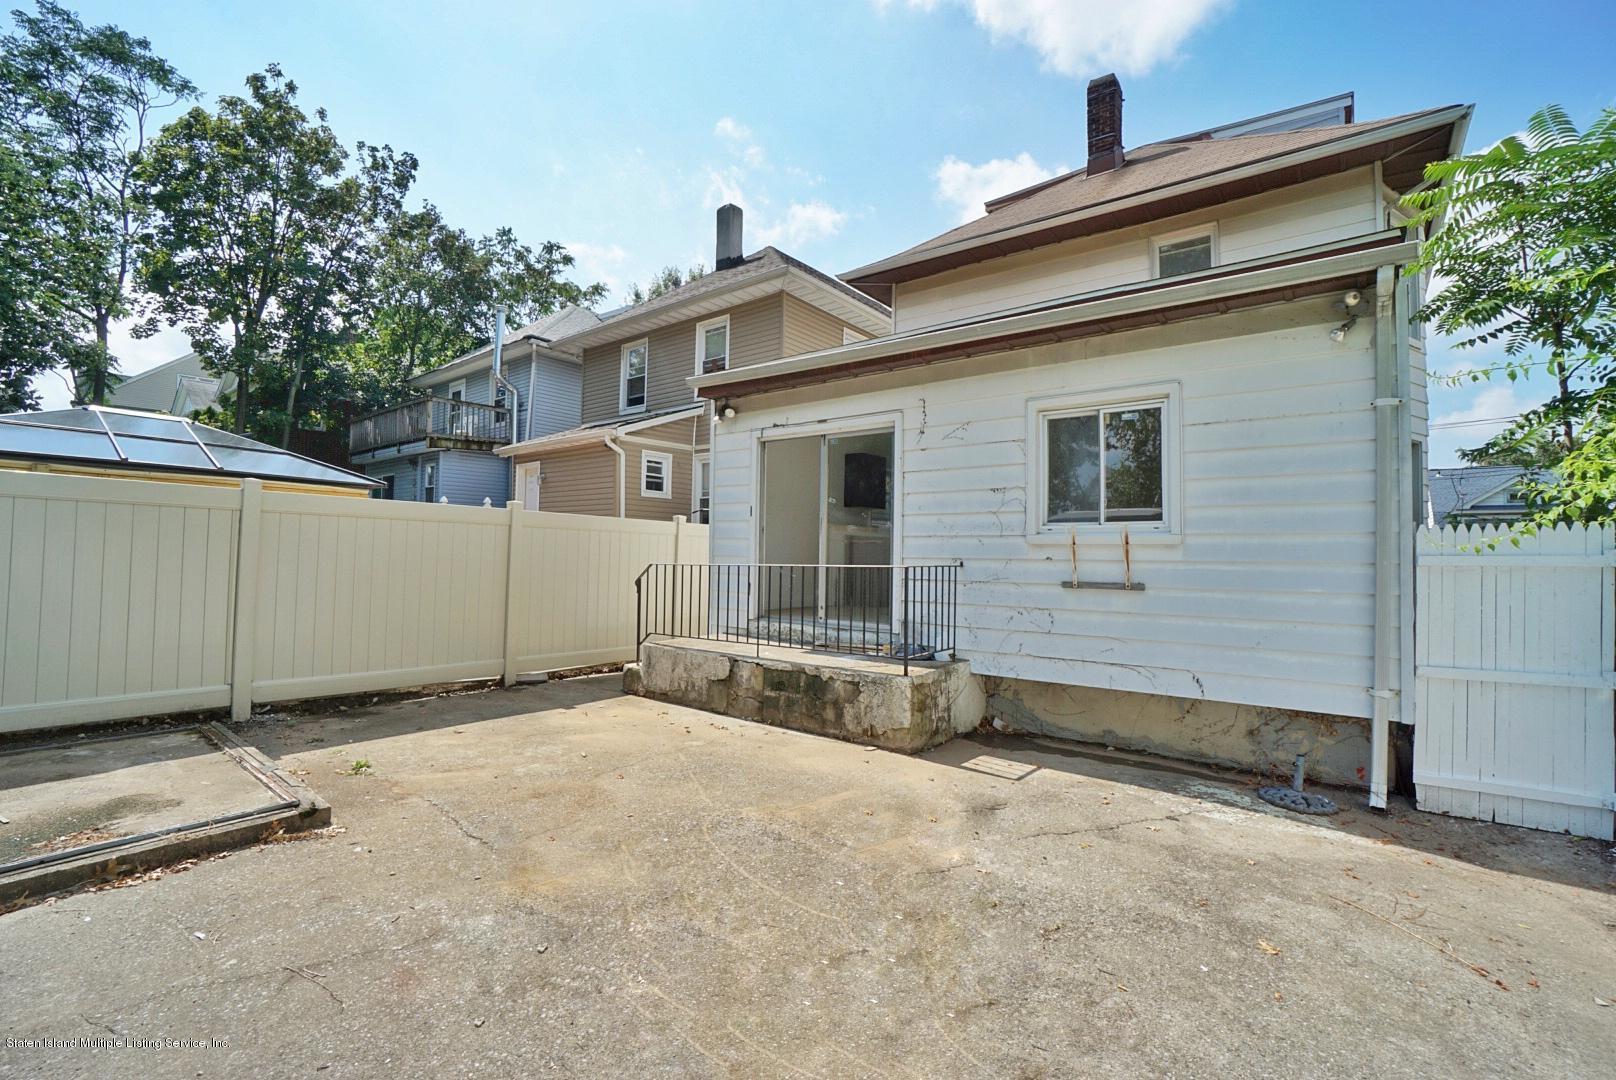 Single Family - Detached 53 Dubois Avenue  Staten Island, NY 10310, MLS-1128749-44